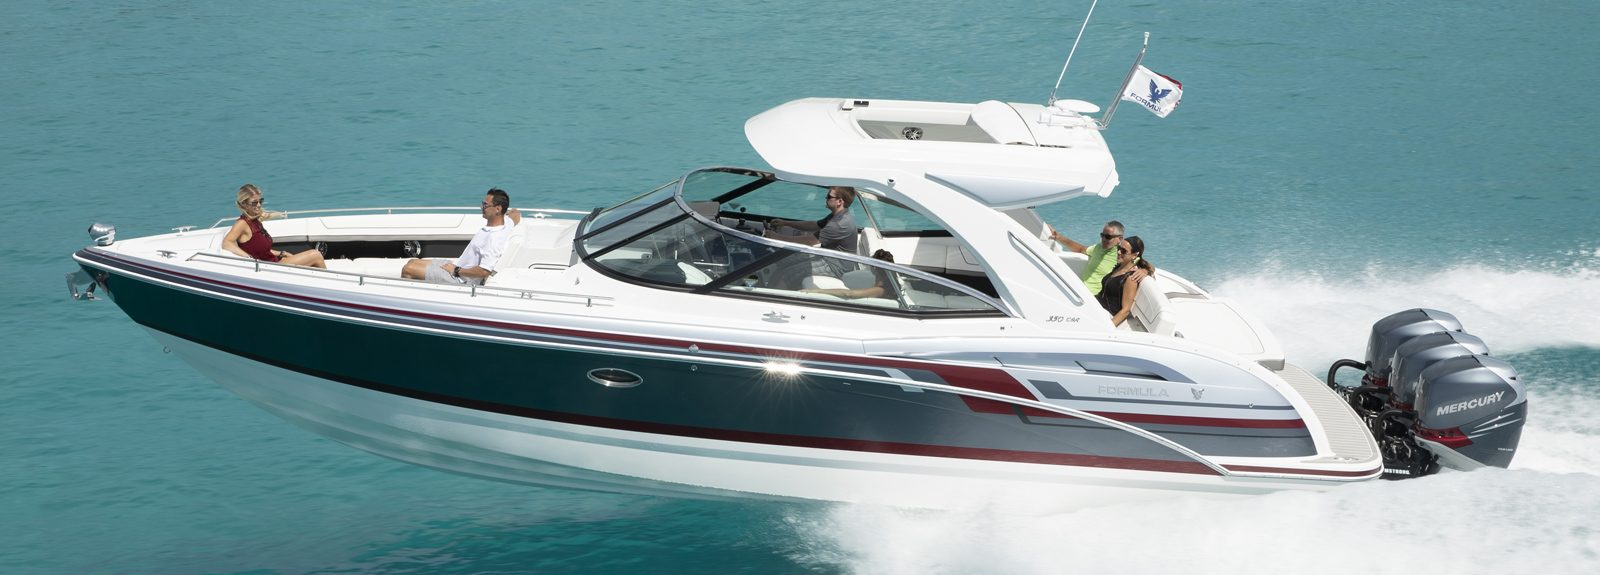 kamaralı-lüks-tekne-bowrider-Formula-350CBR